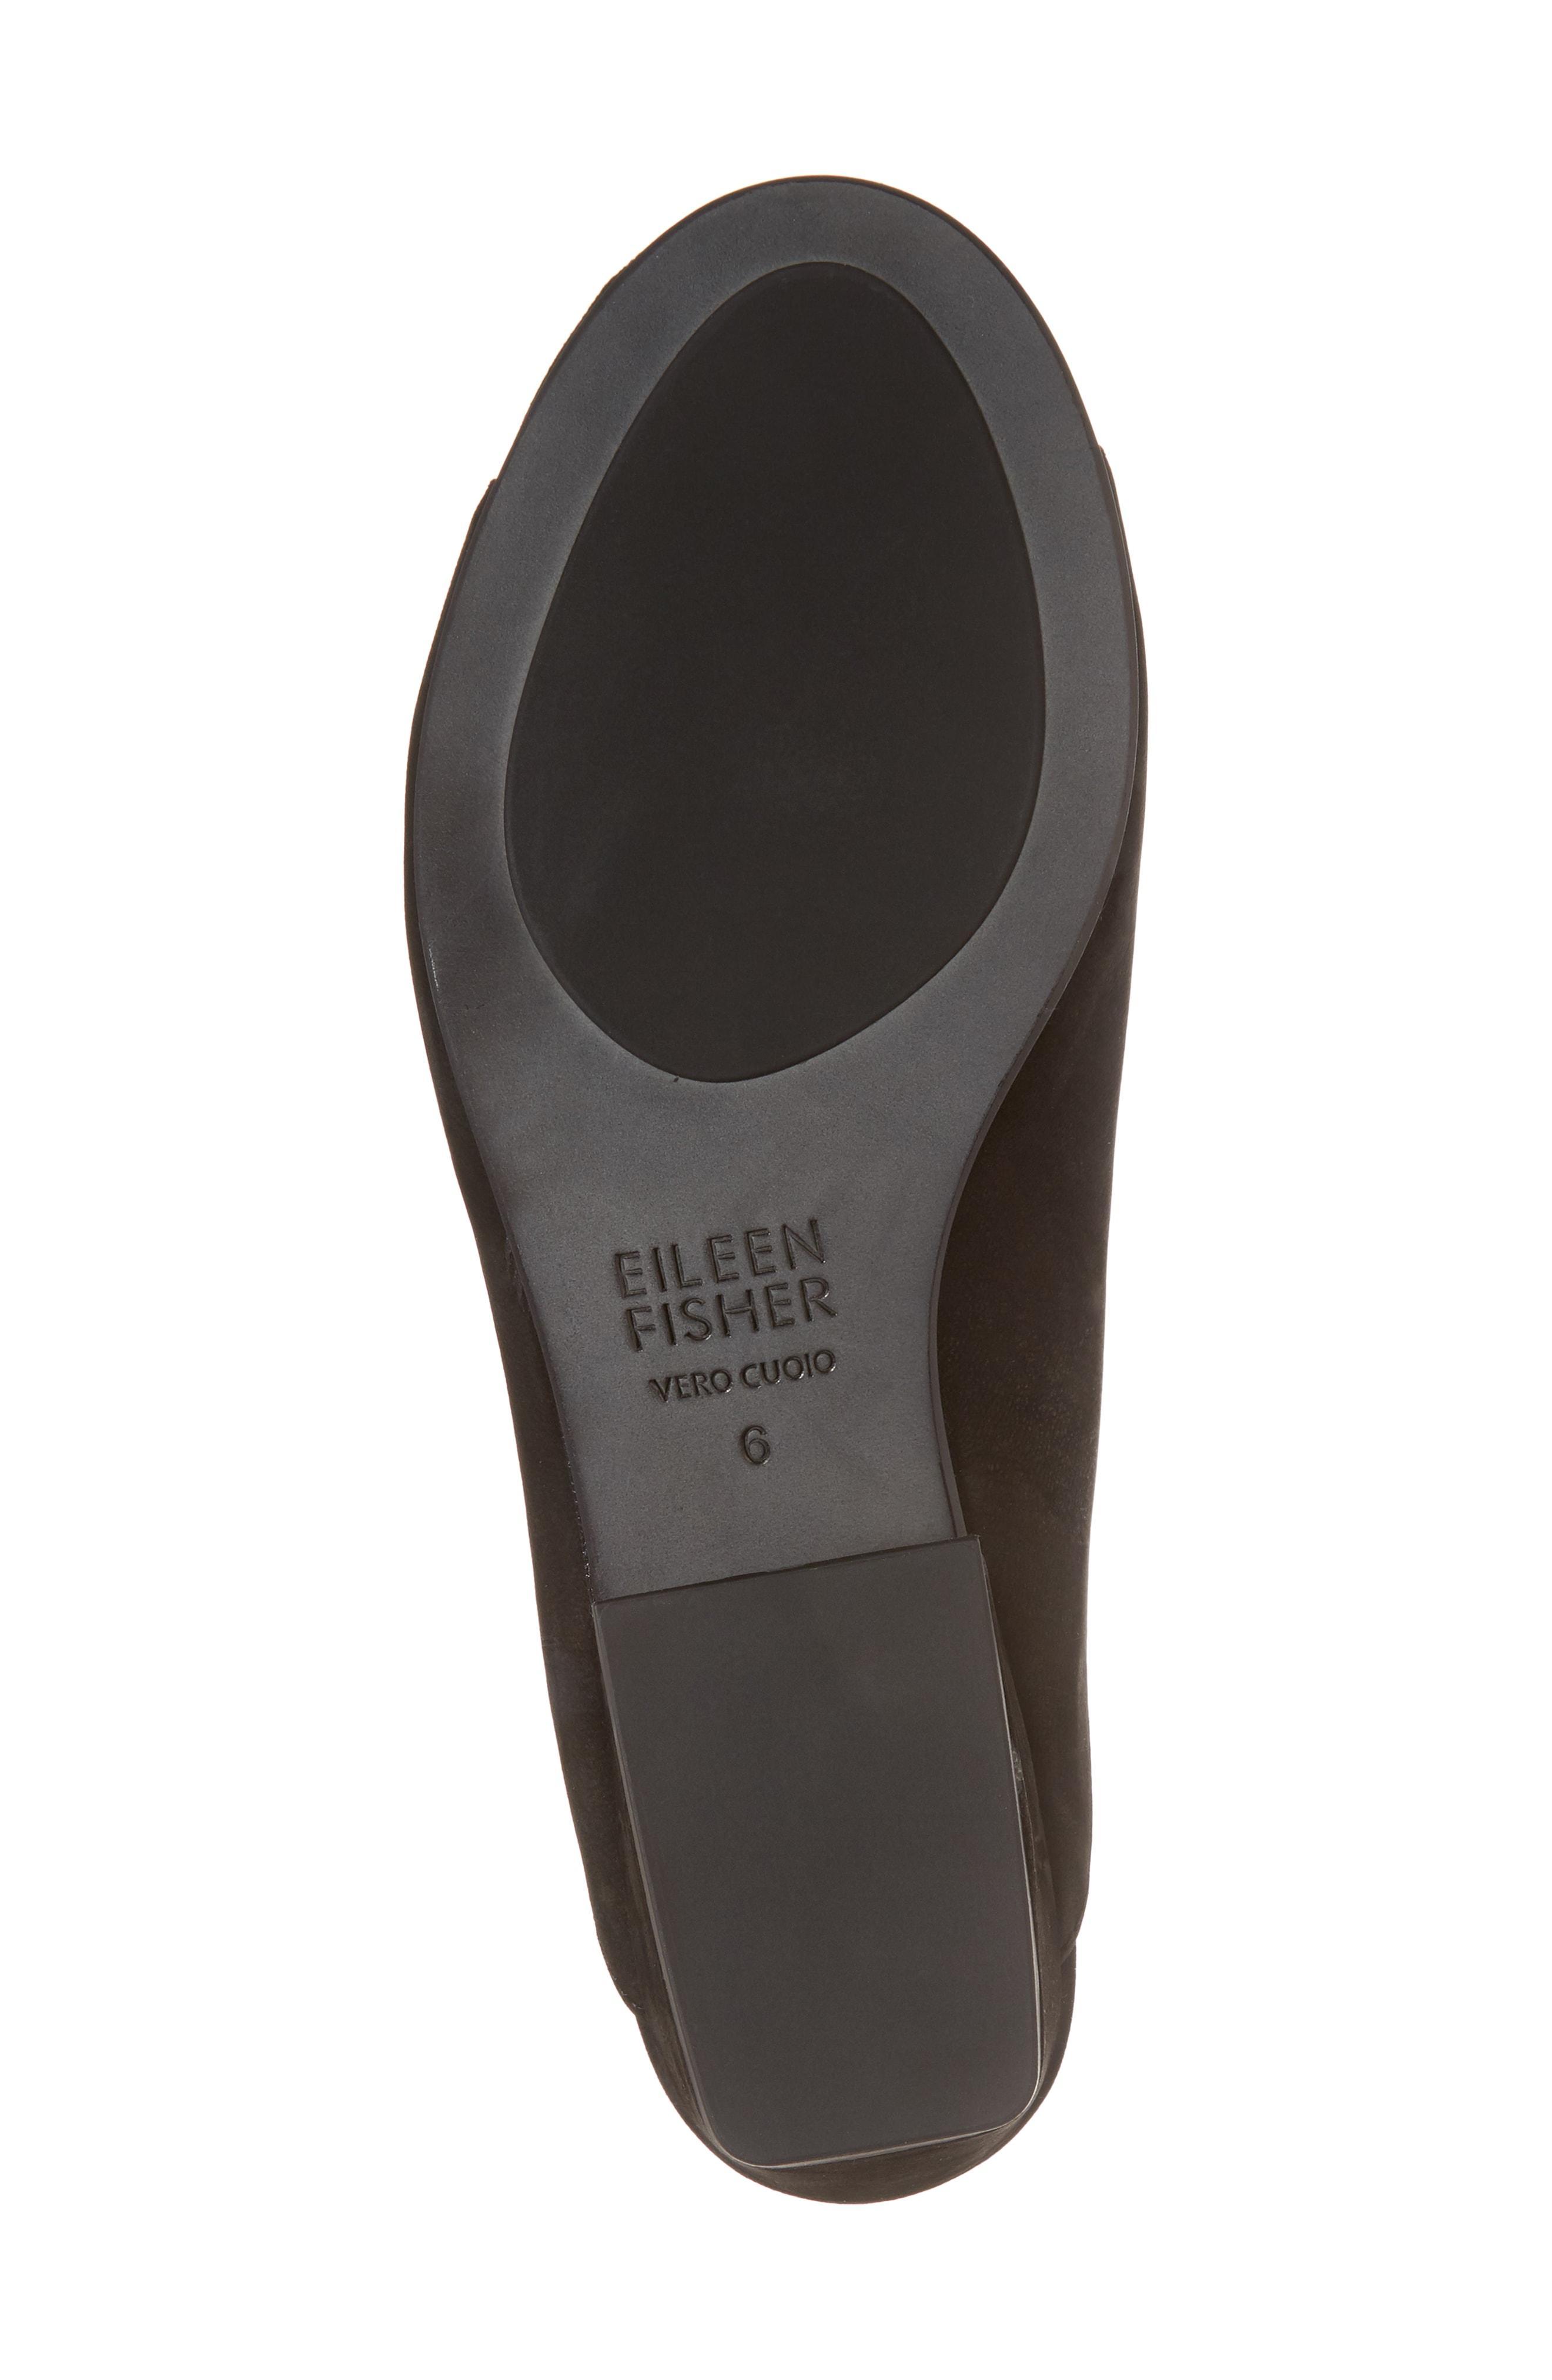 89c1fef08737 Eileen Fisher Women s Katniss Nubuck Leather Block Heel Slide Sandals In  Black Tumbled Nubuck